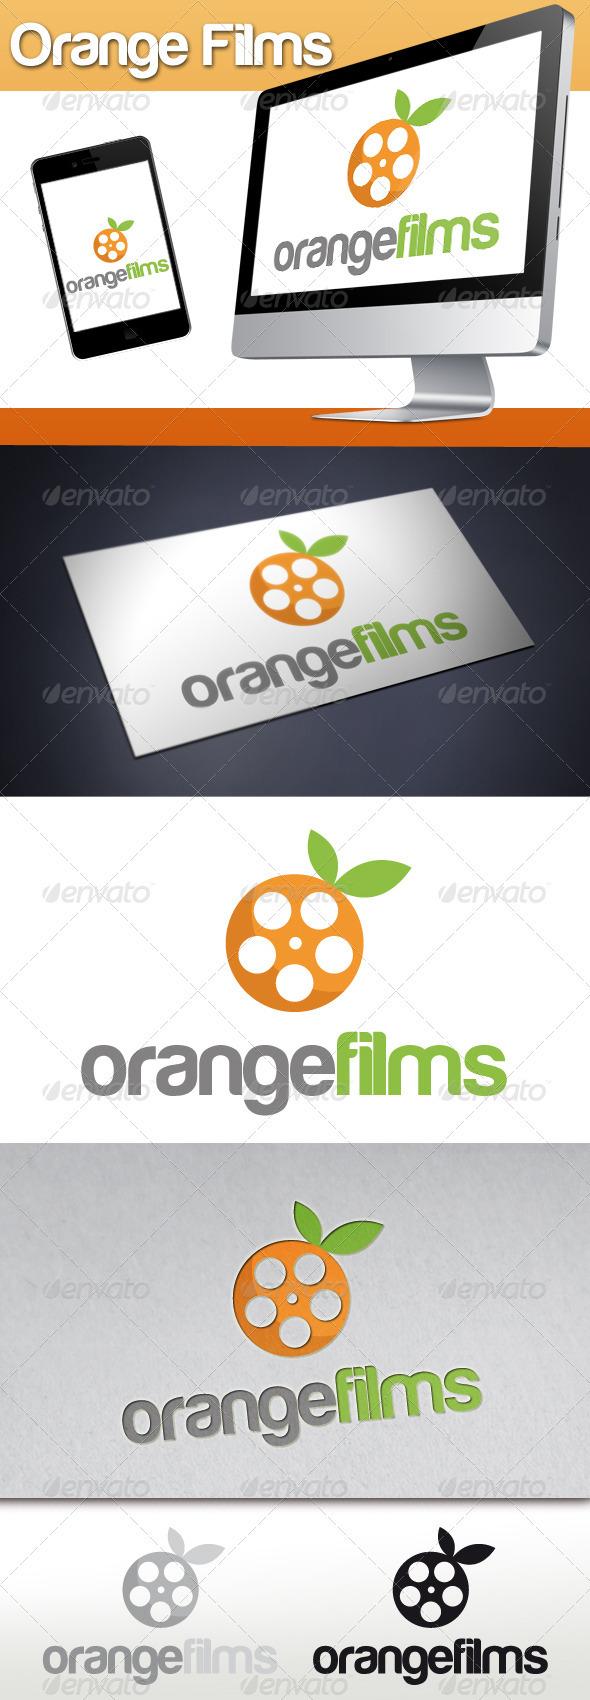 Orange Films Logo